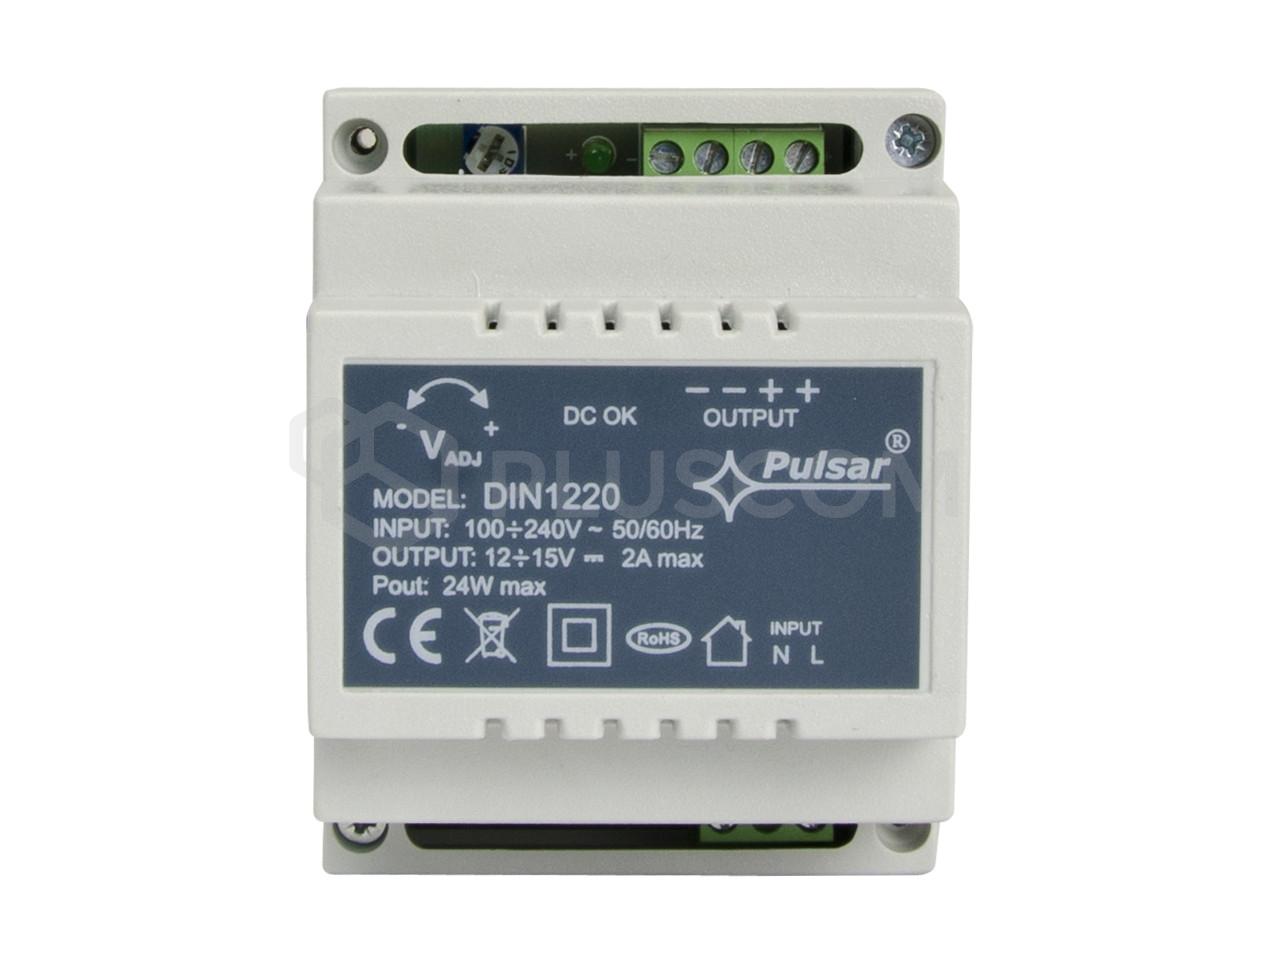 DIN1220 DC 12V 2A DIN rail power supply